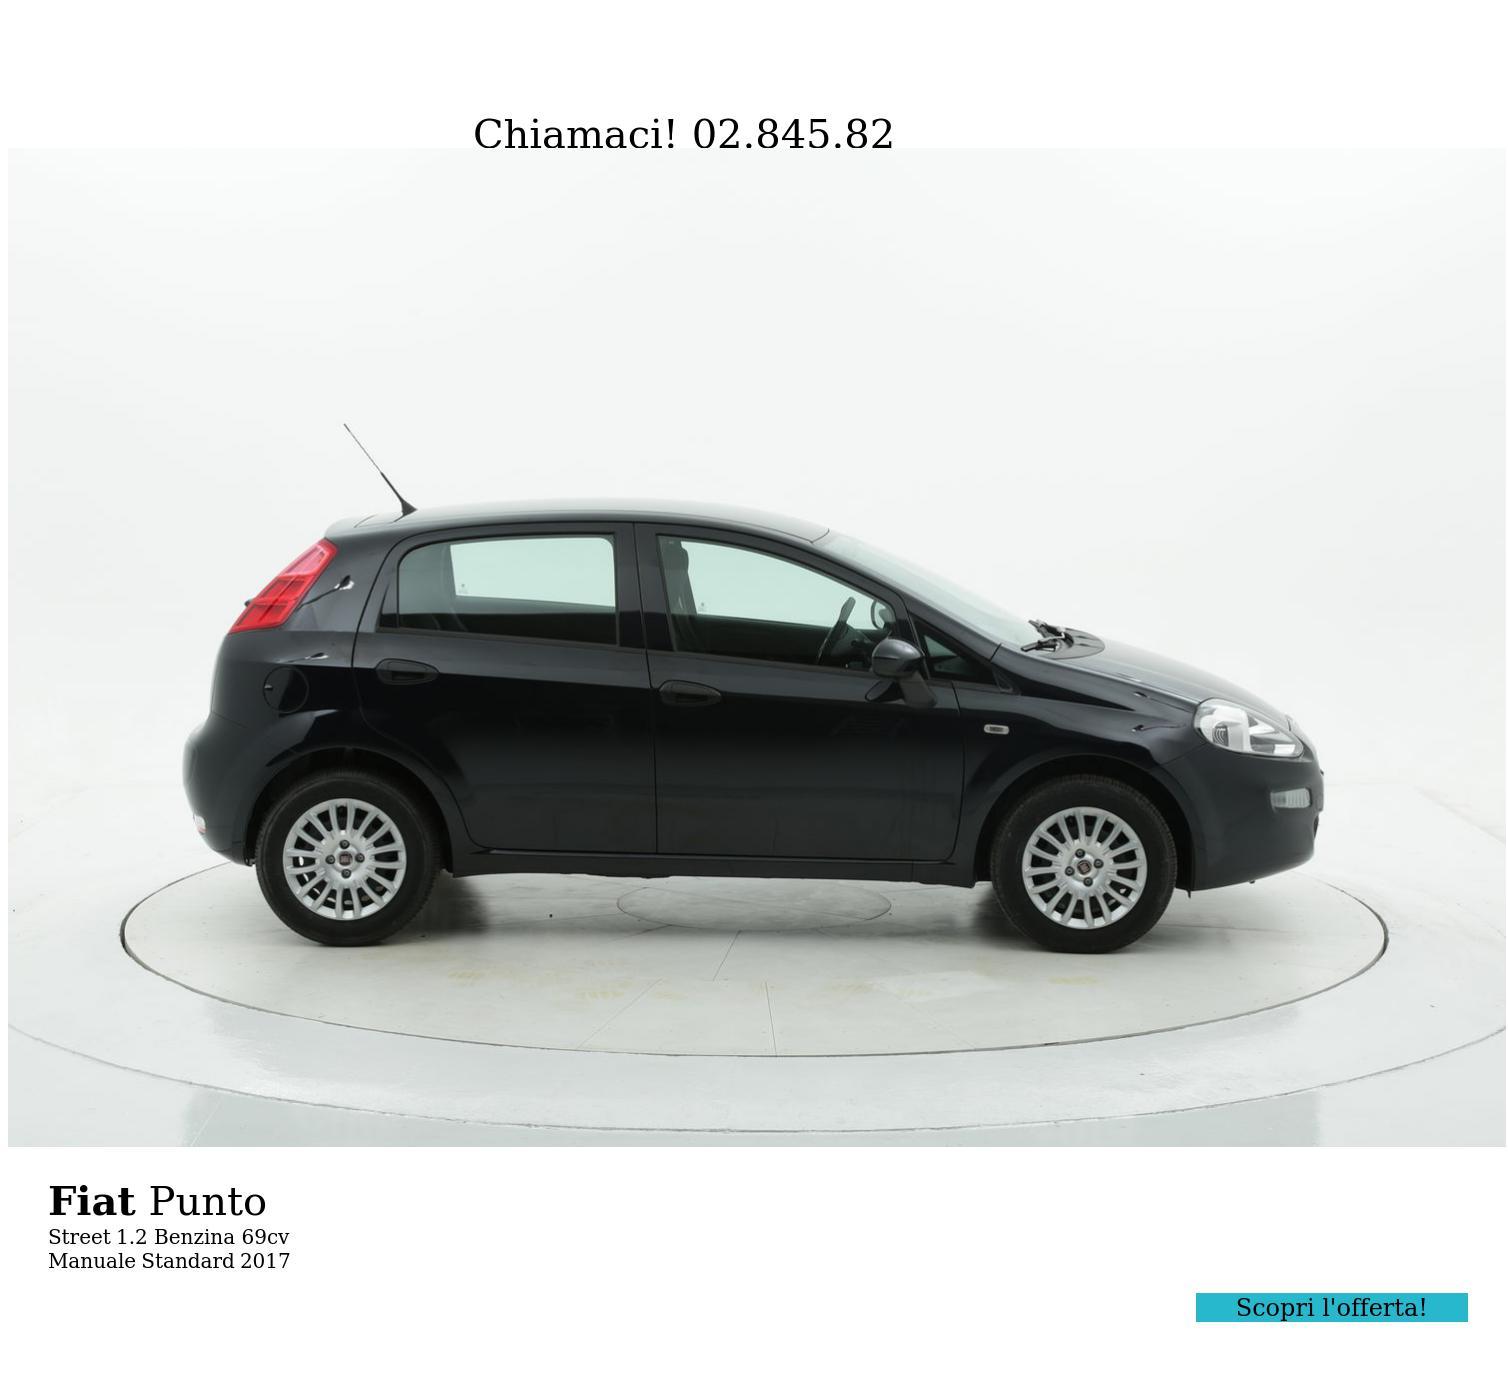 Fiat Punto Street km 0 benzina blu   brumbrum